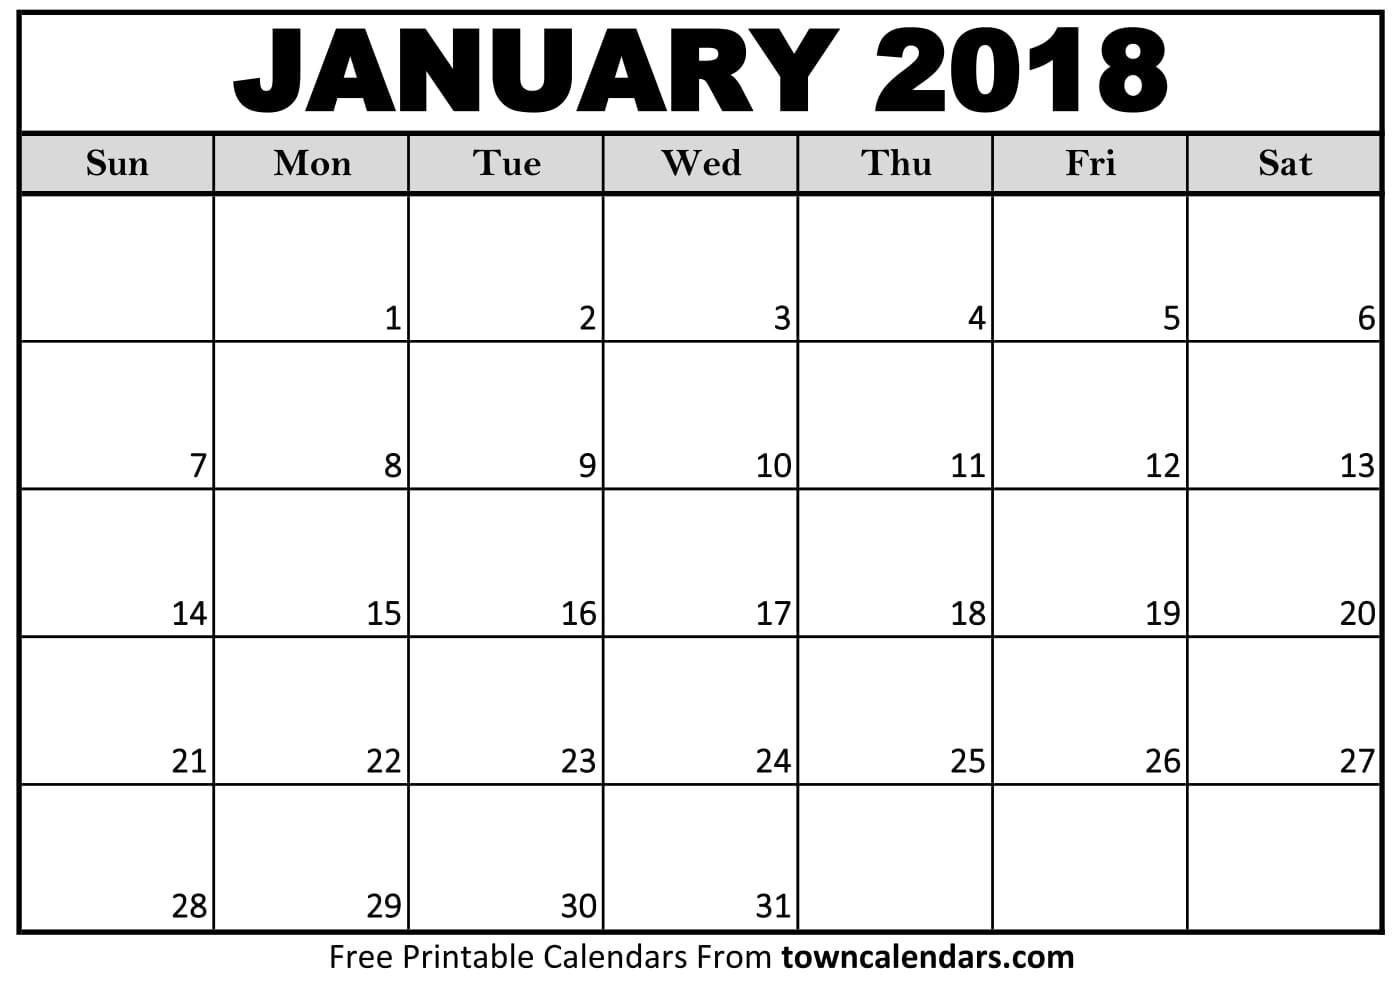 Calendar Template Free Printable 2018 Calendar Printable towncalendars